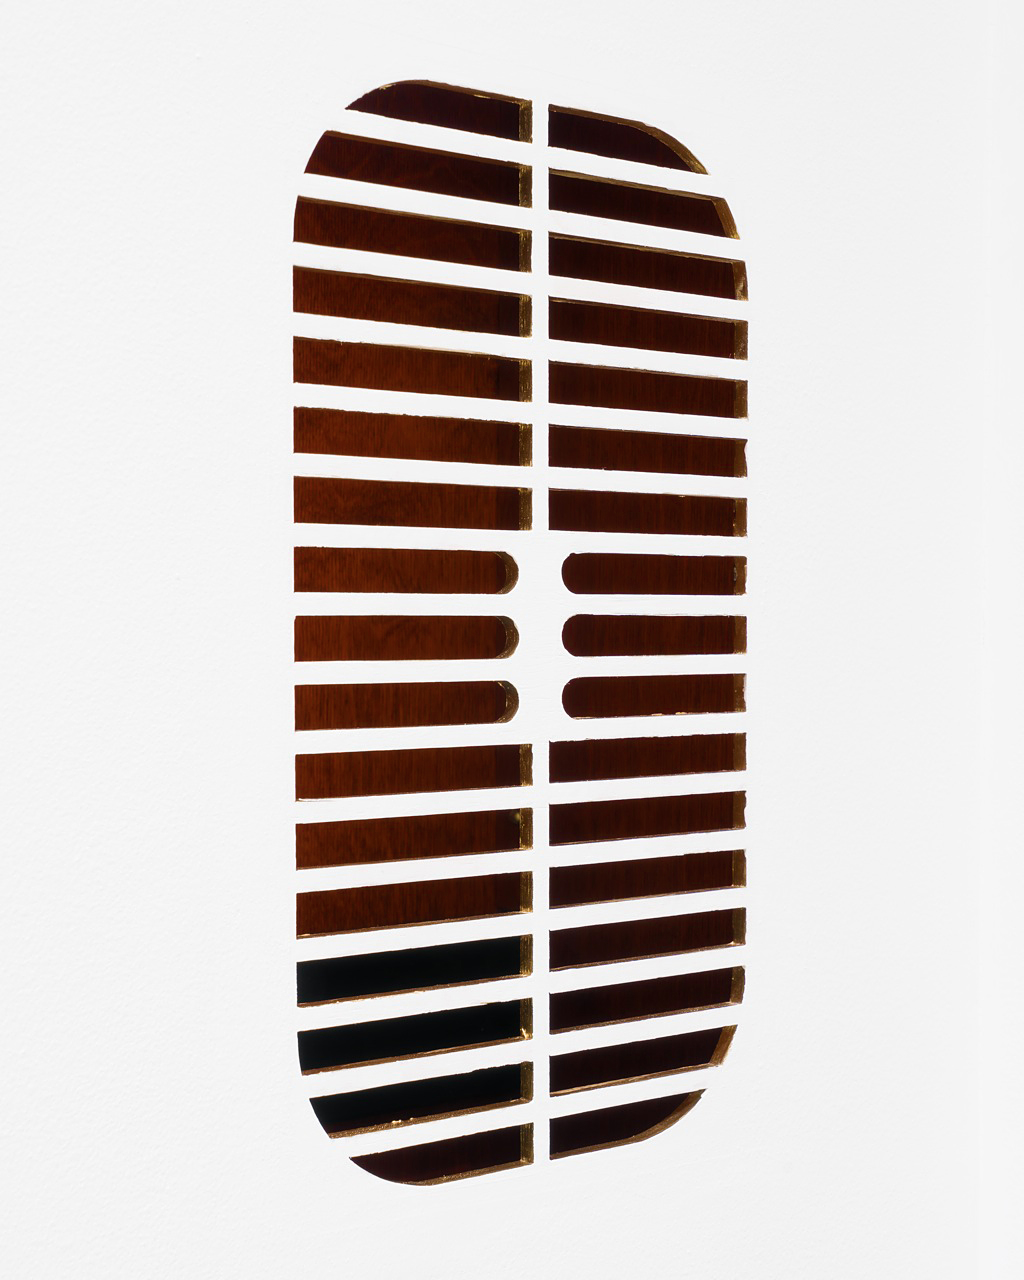 Photo: Krisopher McKay, © Solomon R. Guggenheim Foundation, New York